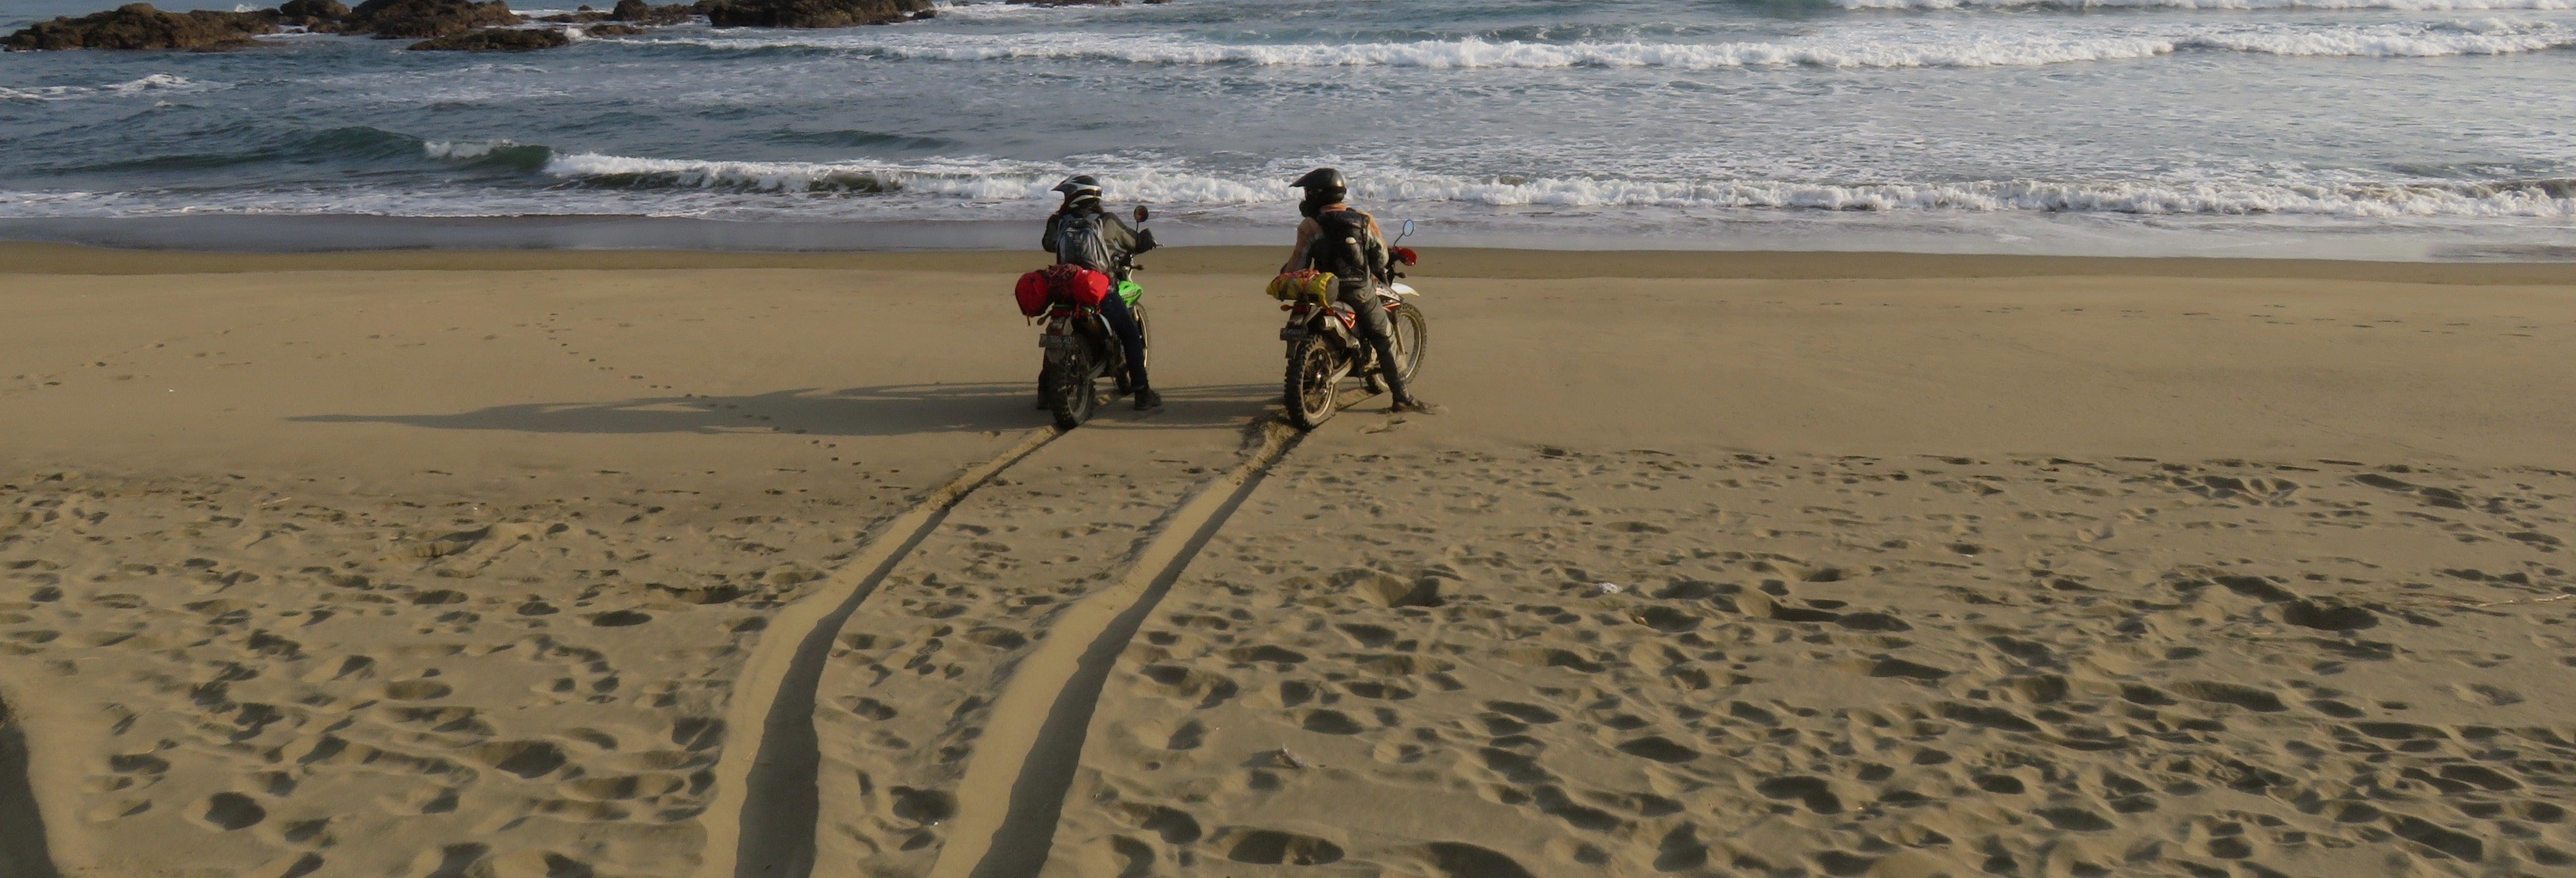 Tour en moto por Bali